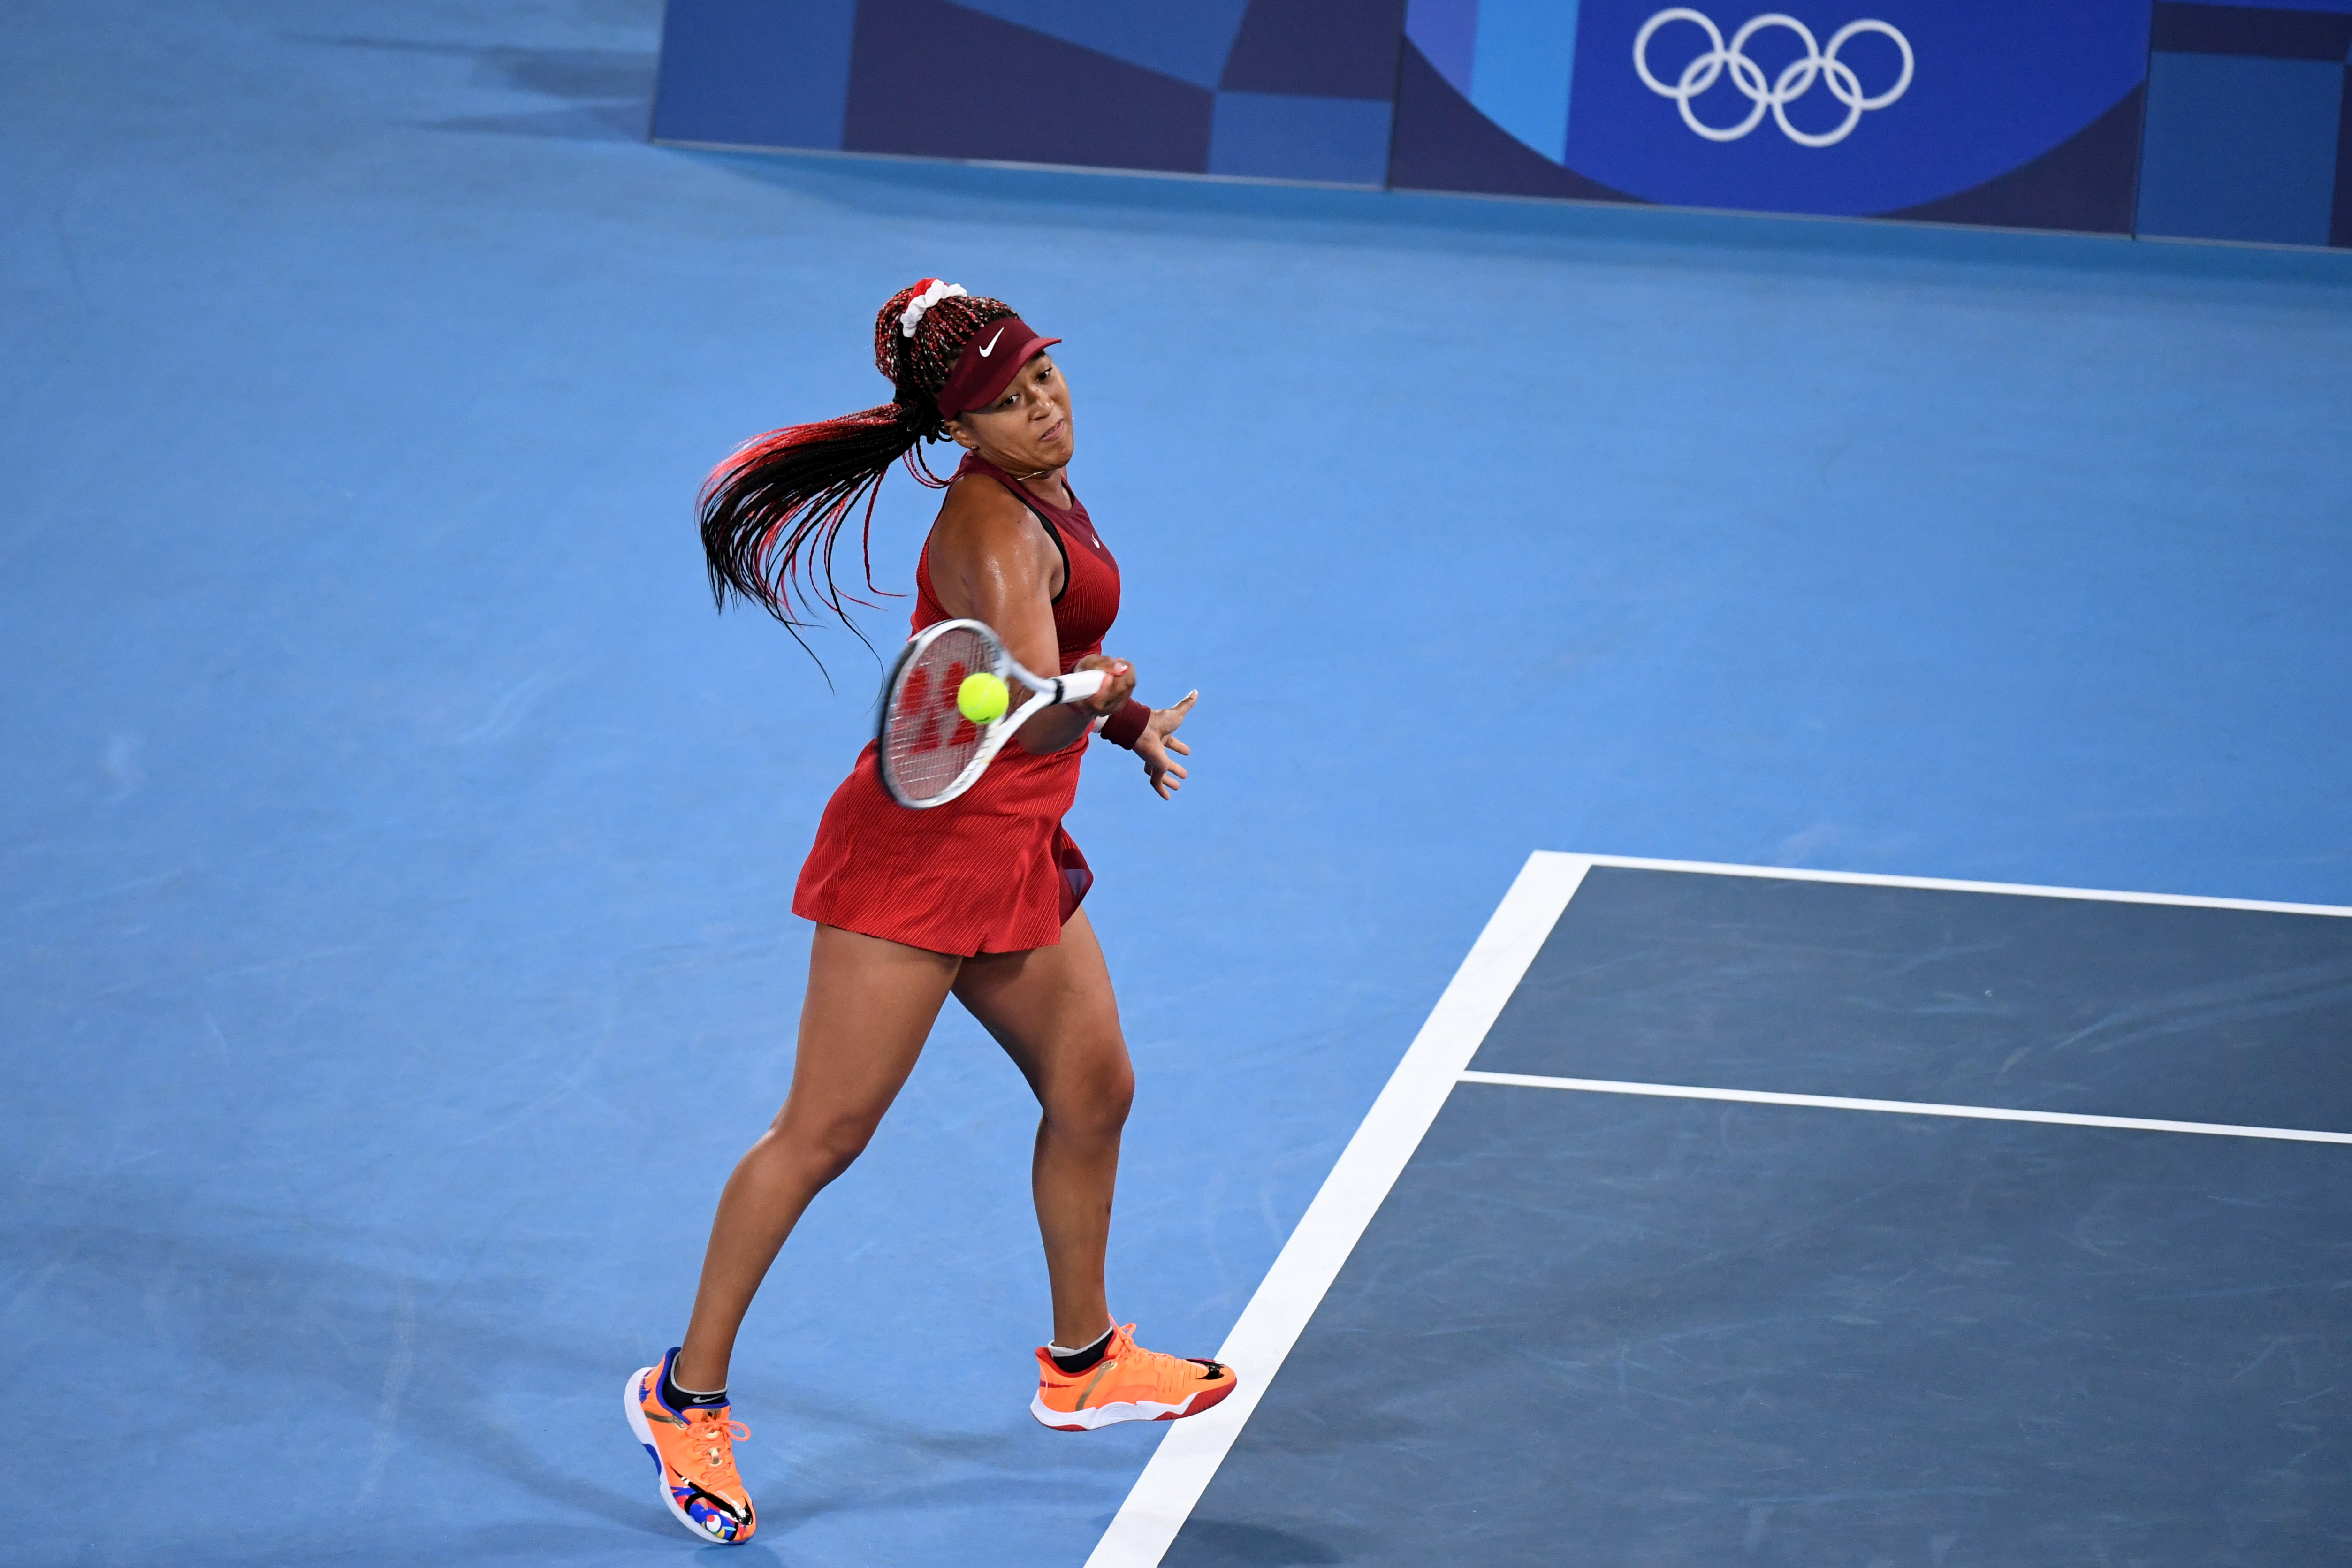 Tokyo 2020 Olympics - Tennis - Women's Singles - Round 3 - Ariake Tennis Park - Tokyo, Japan - July 27, 2021. Naomi Osaka of Japan in action during her third round match against Marketa Vondrousova of Czech Republic REUTERS/Piroschka Van De Wouw